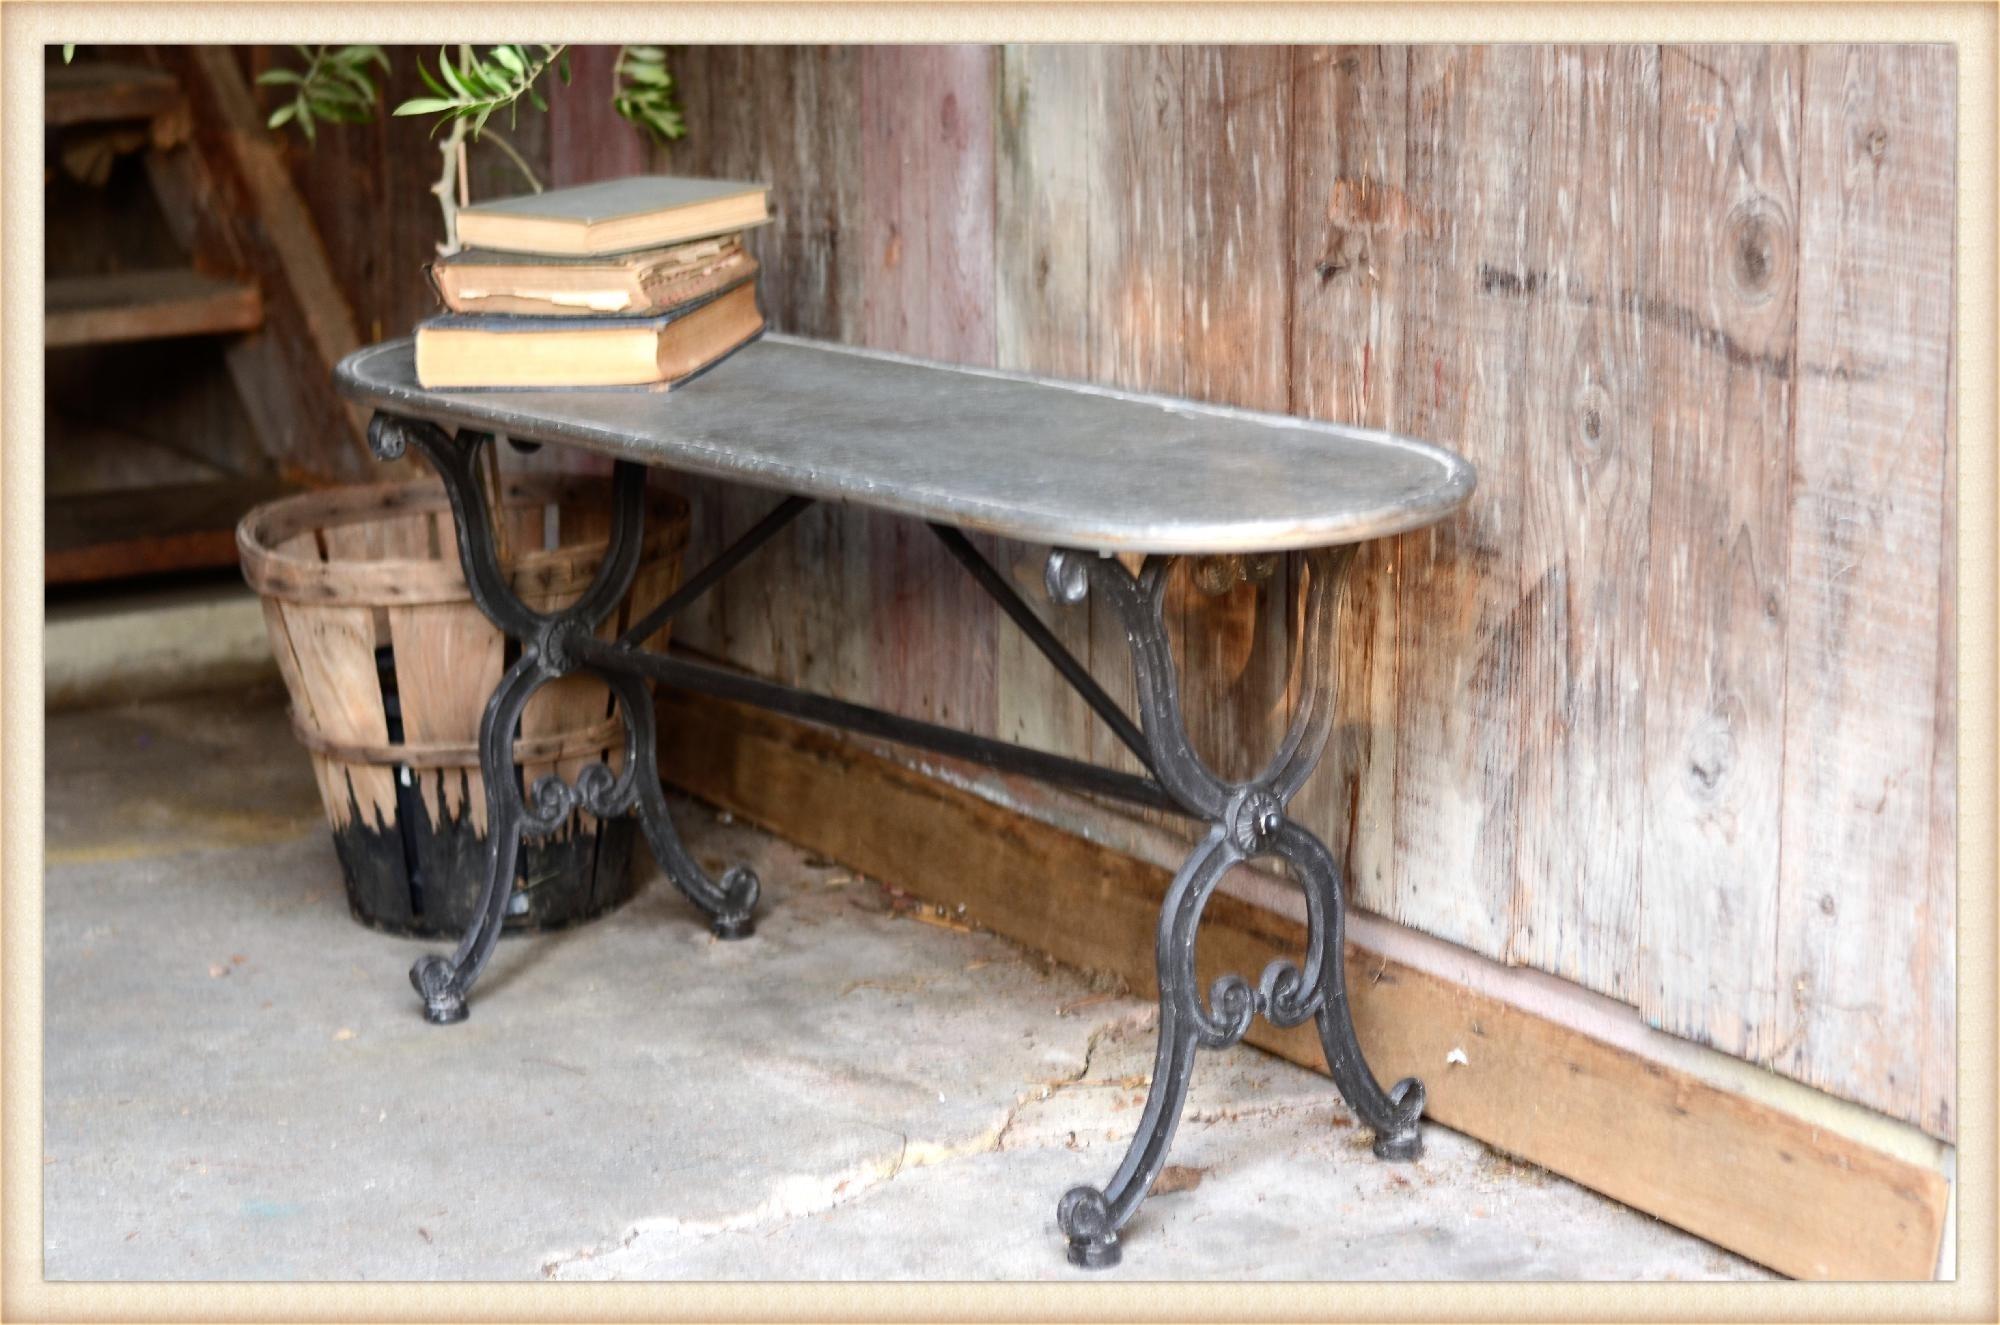 Galvanized Riser Bench